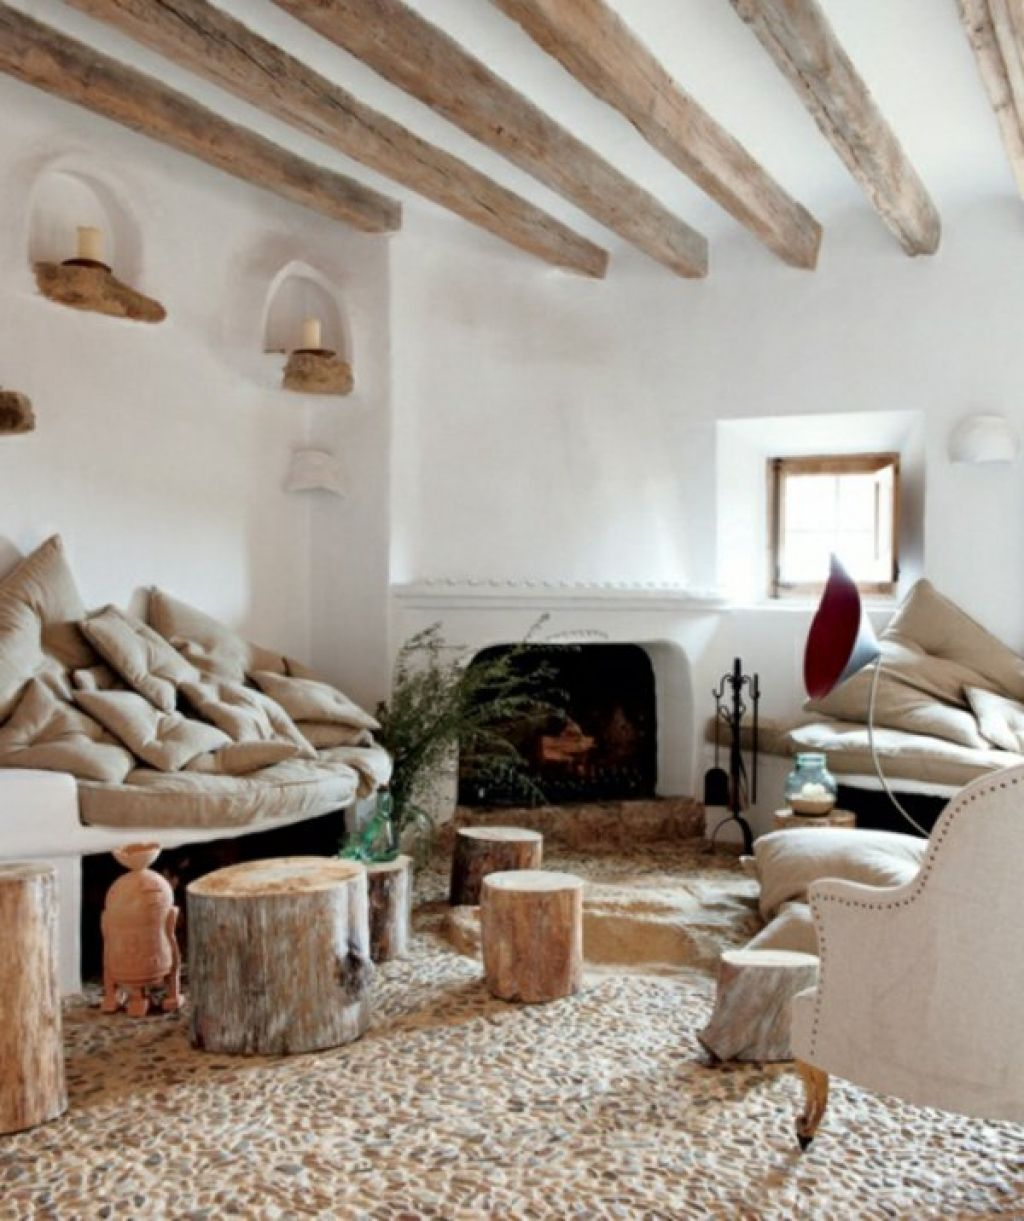 deko ideen wohnzimmer selber machen 21 kreative deko ideen